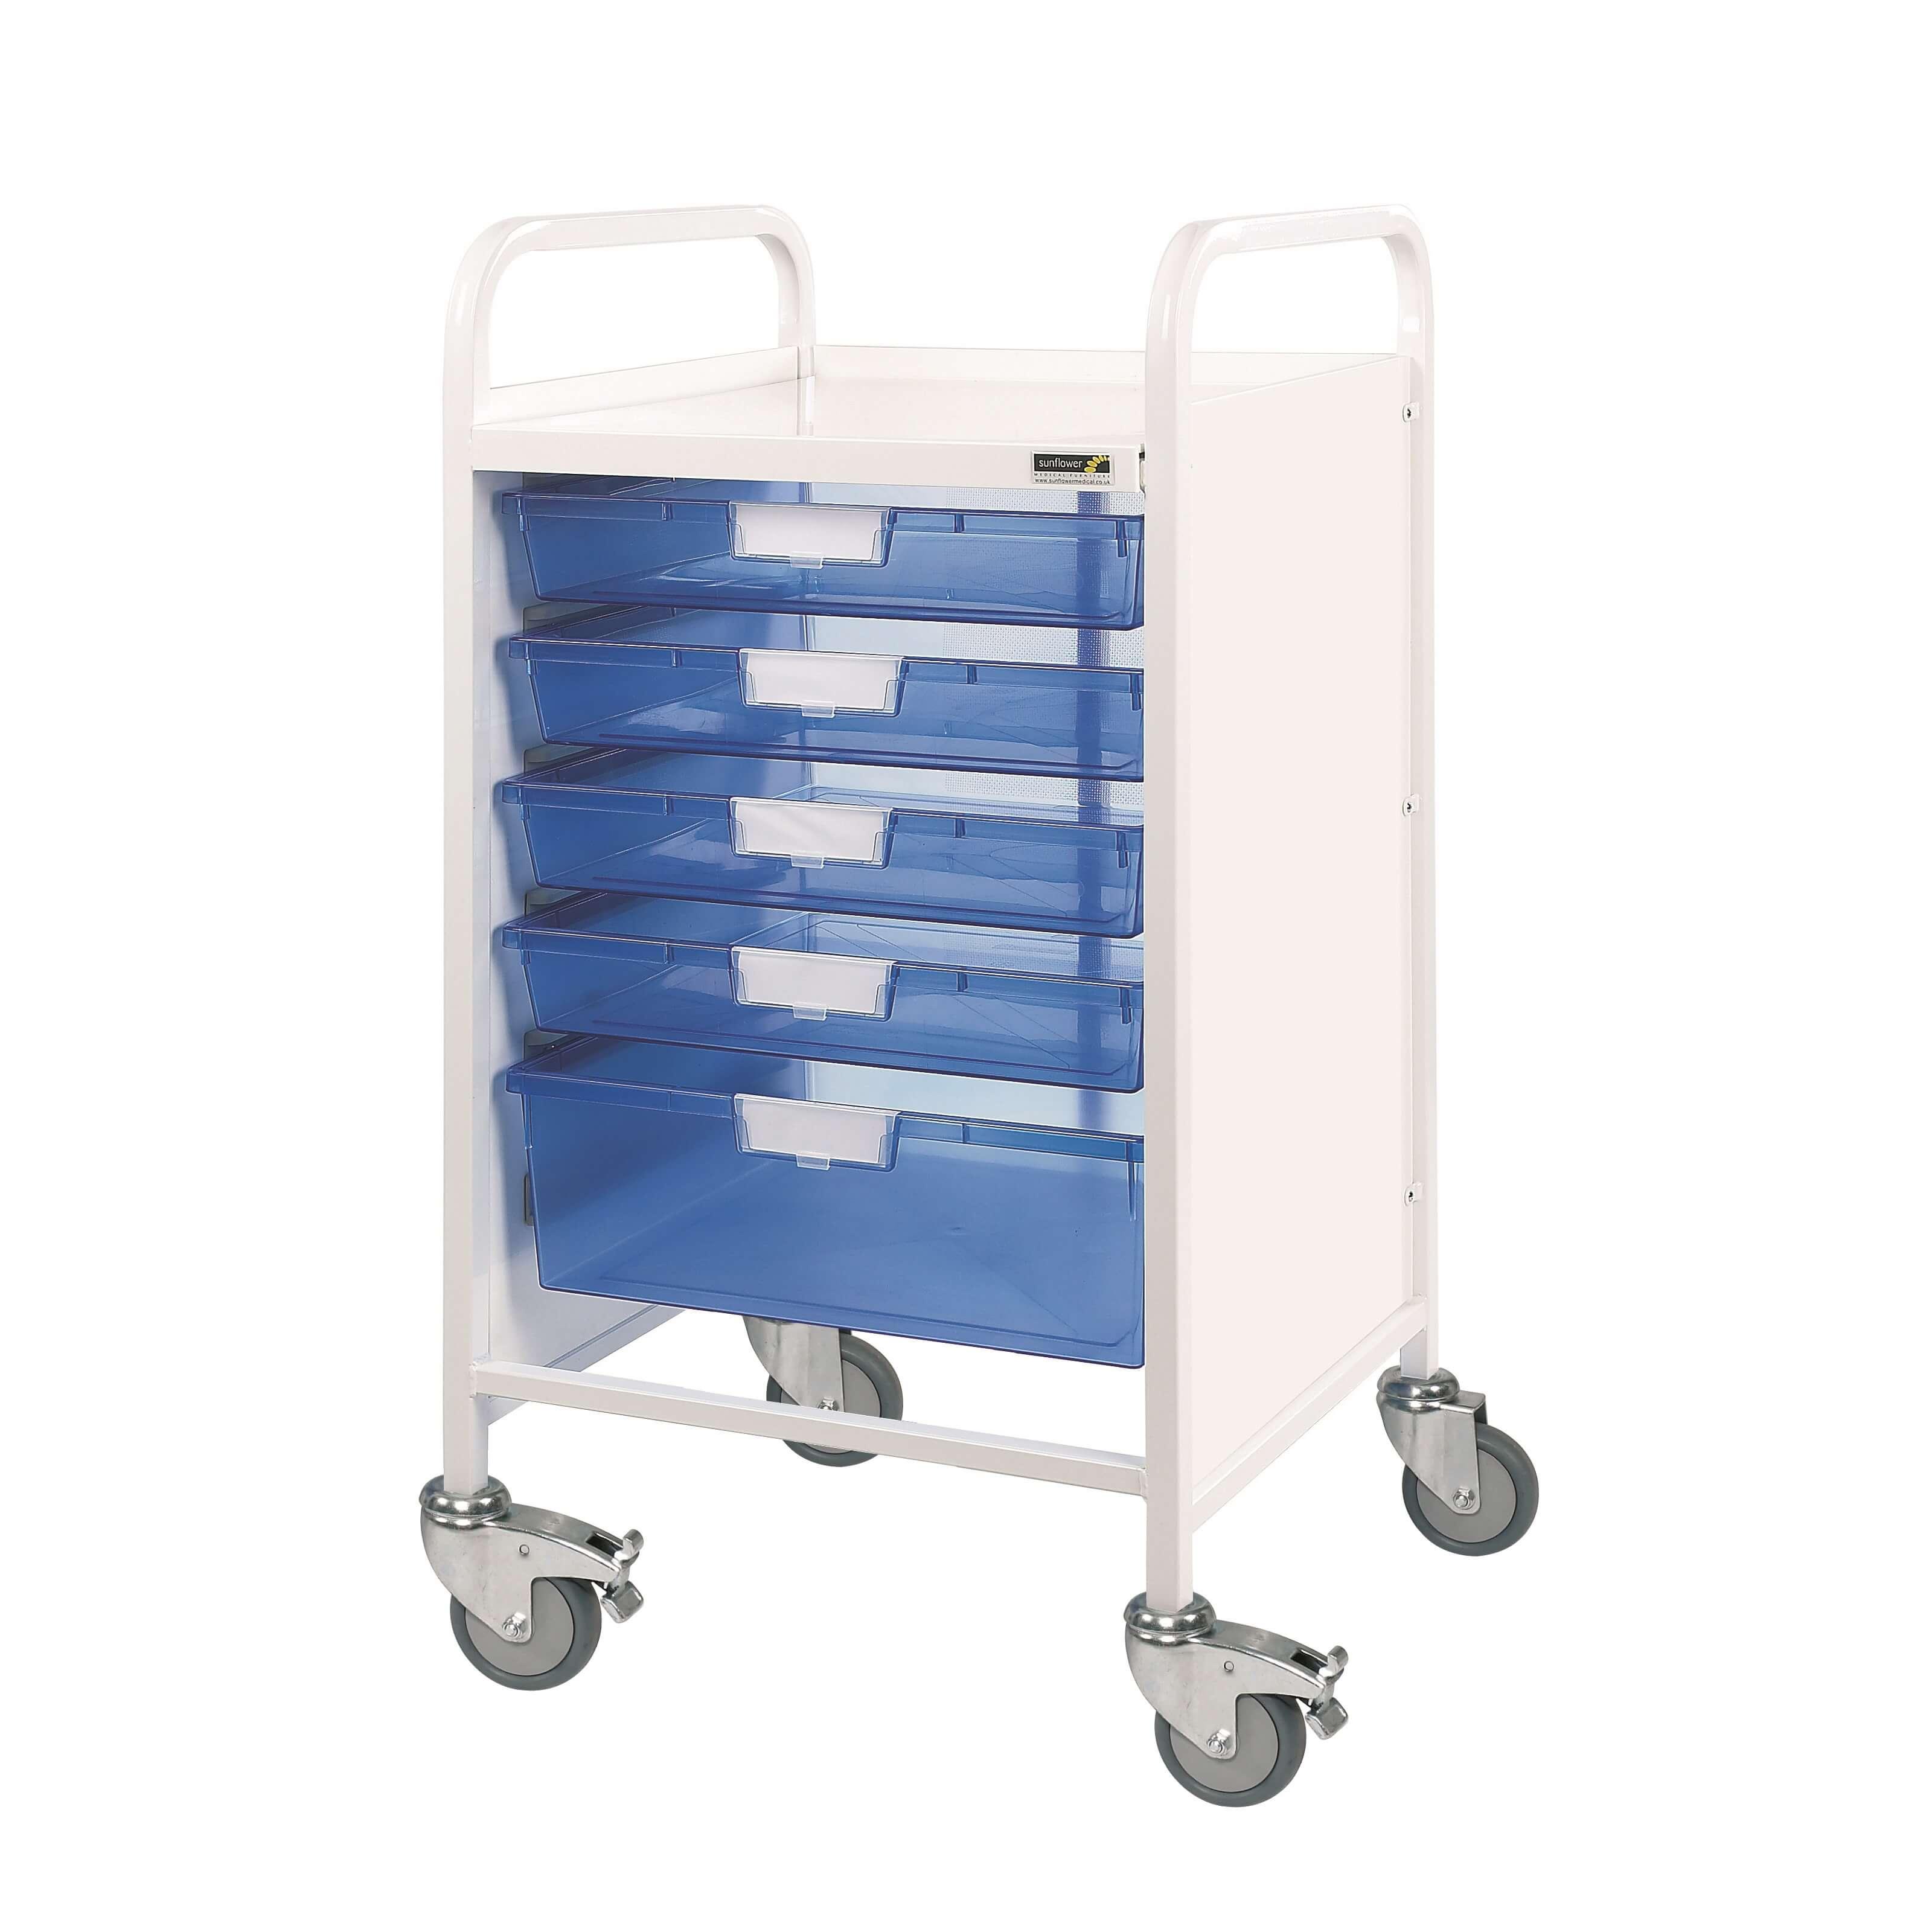 VISTA 50 Trolley 4 Single/1 Double Trays | Medical Supermarket